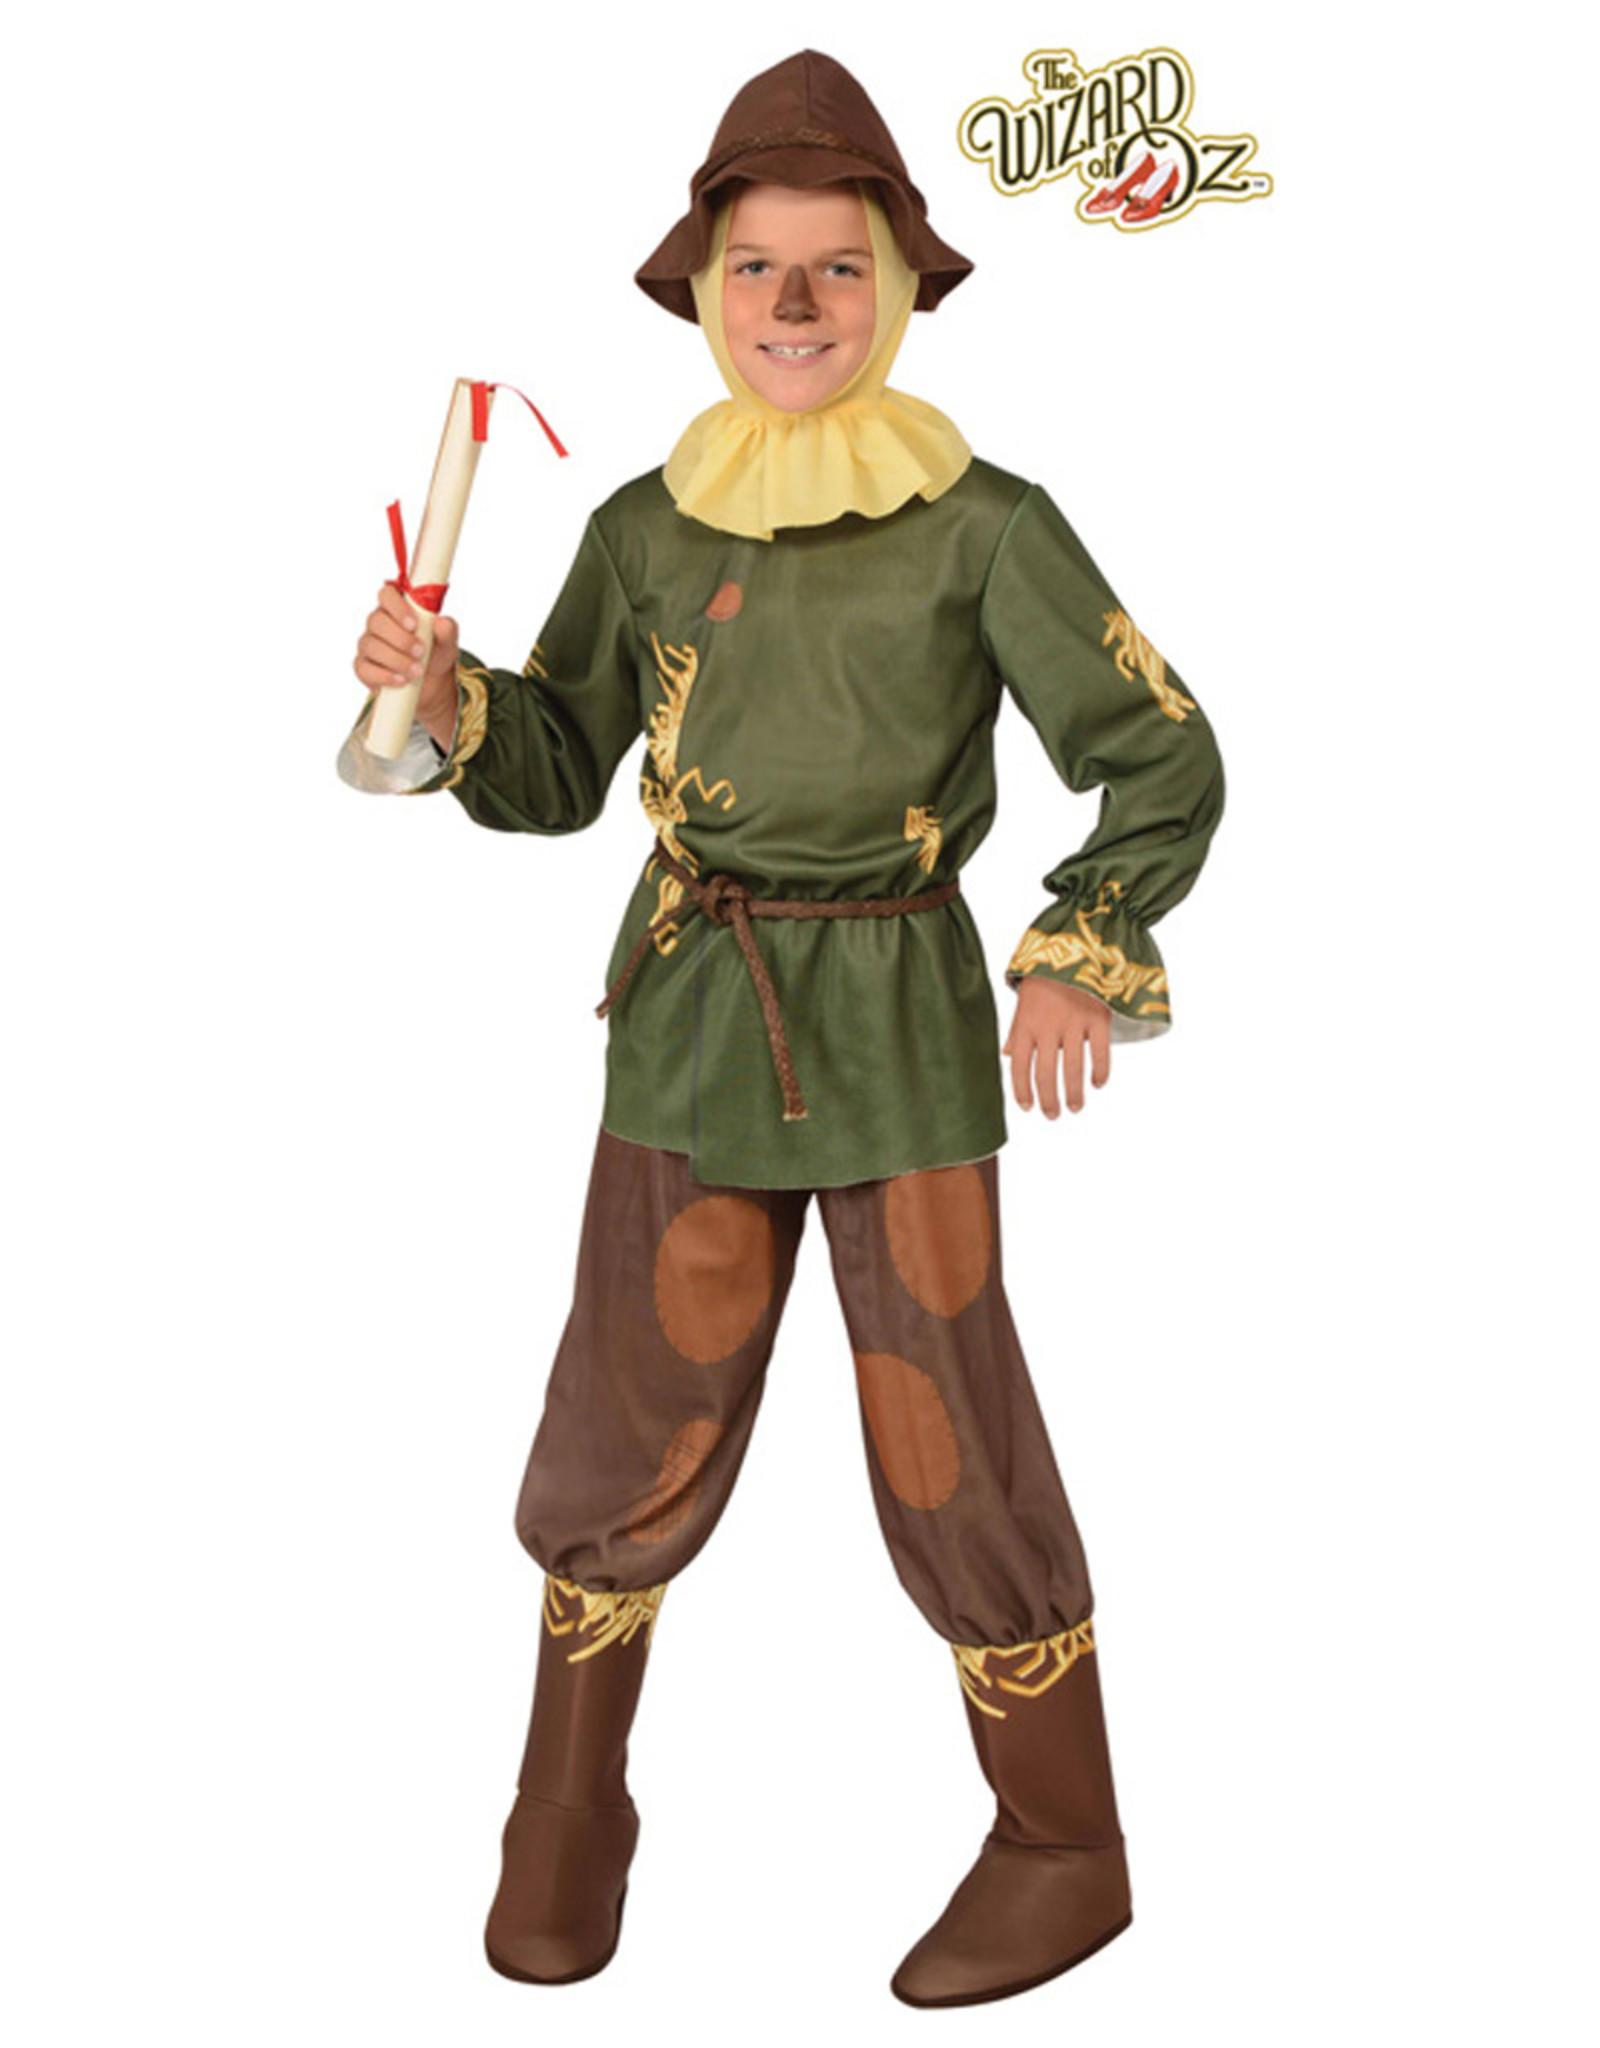 Scarecrow - Wizard of Oz Costume - Boys